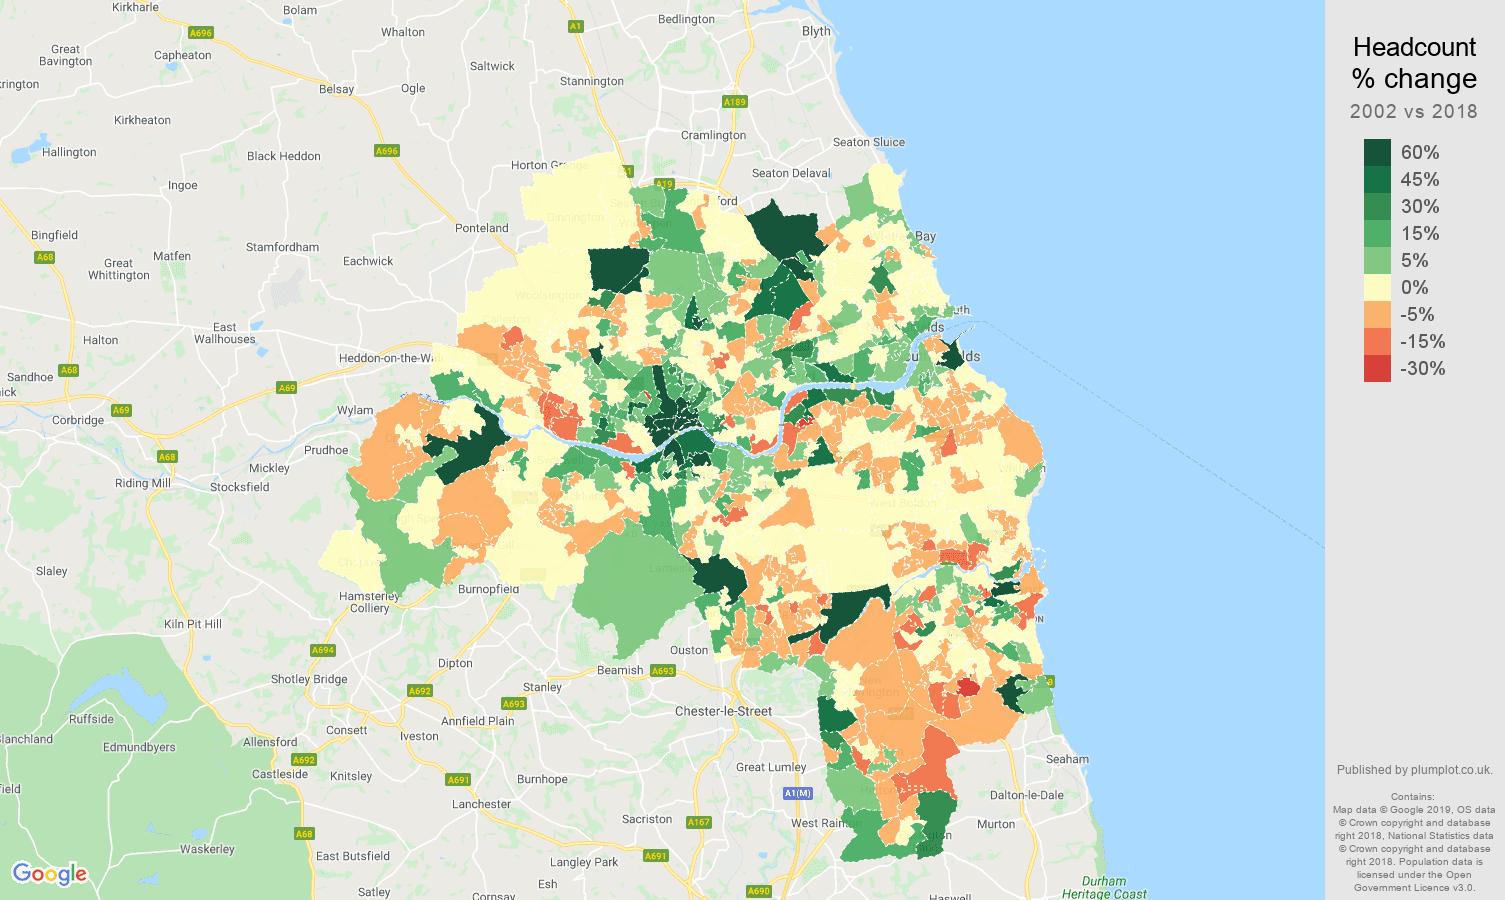 Tyne and Wear headcount change map